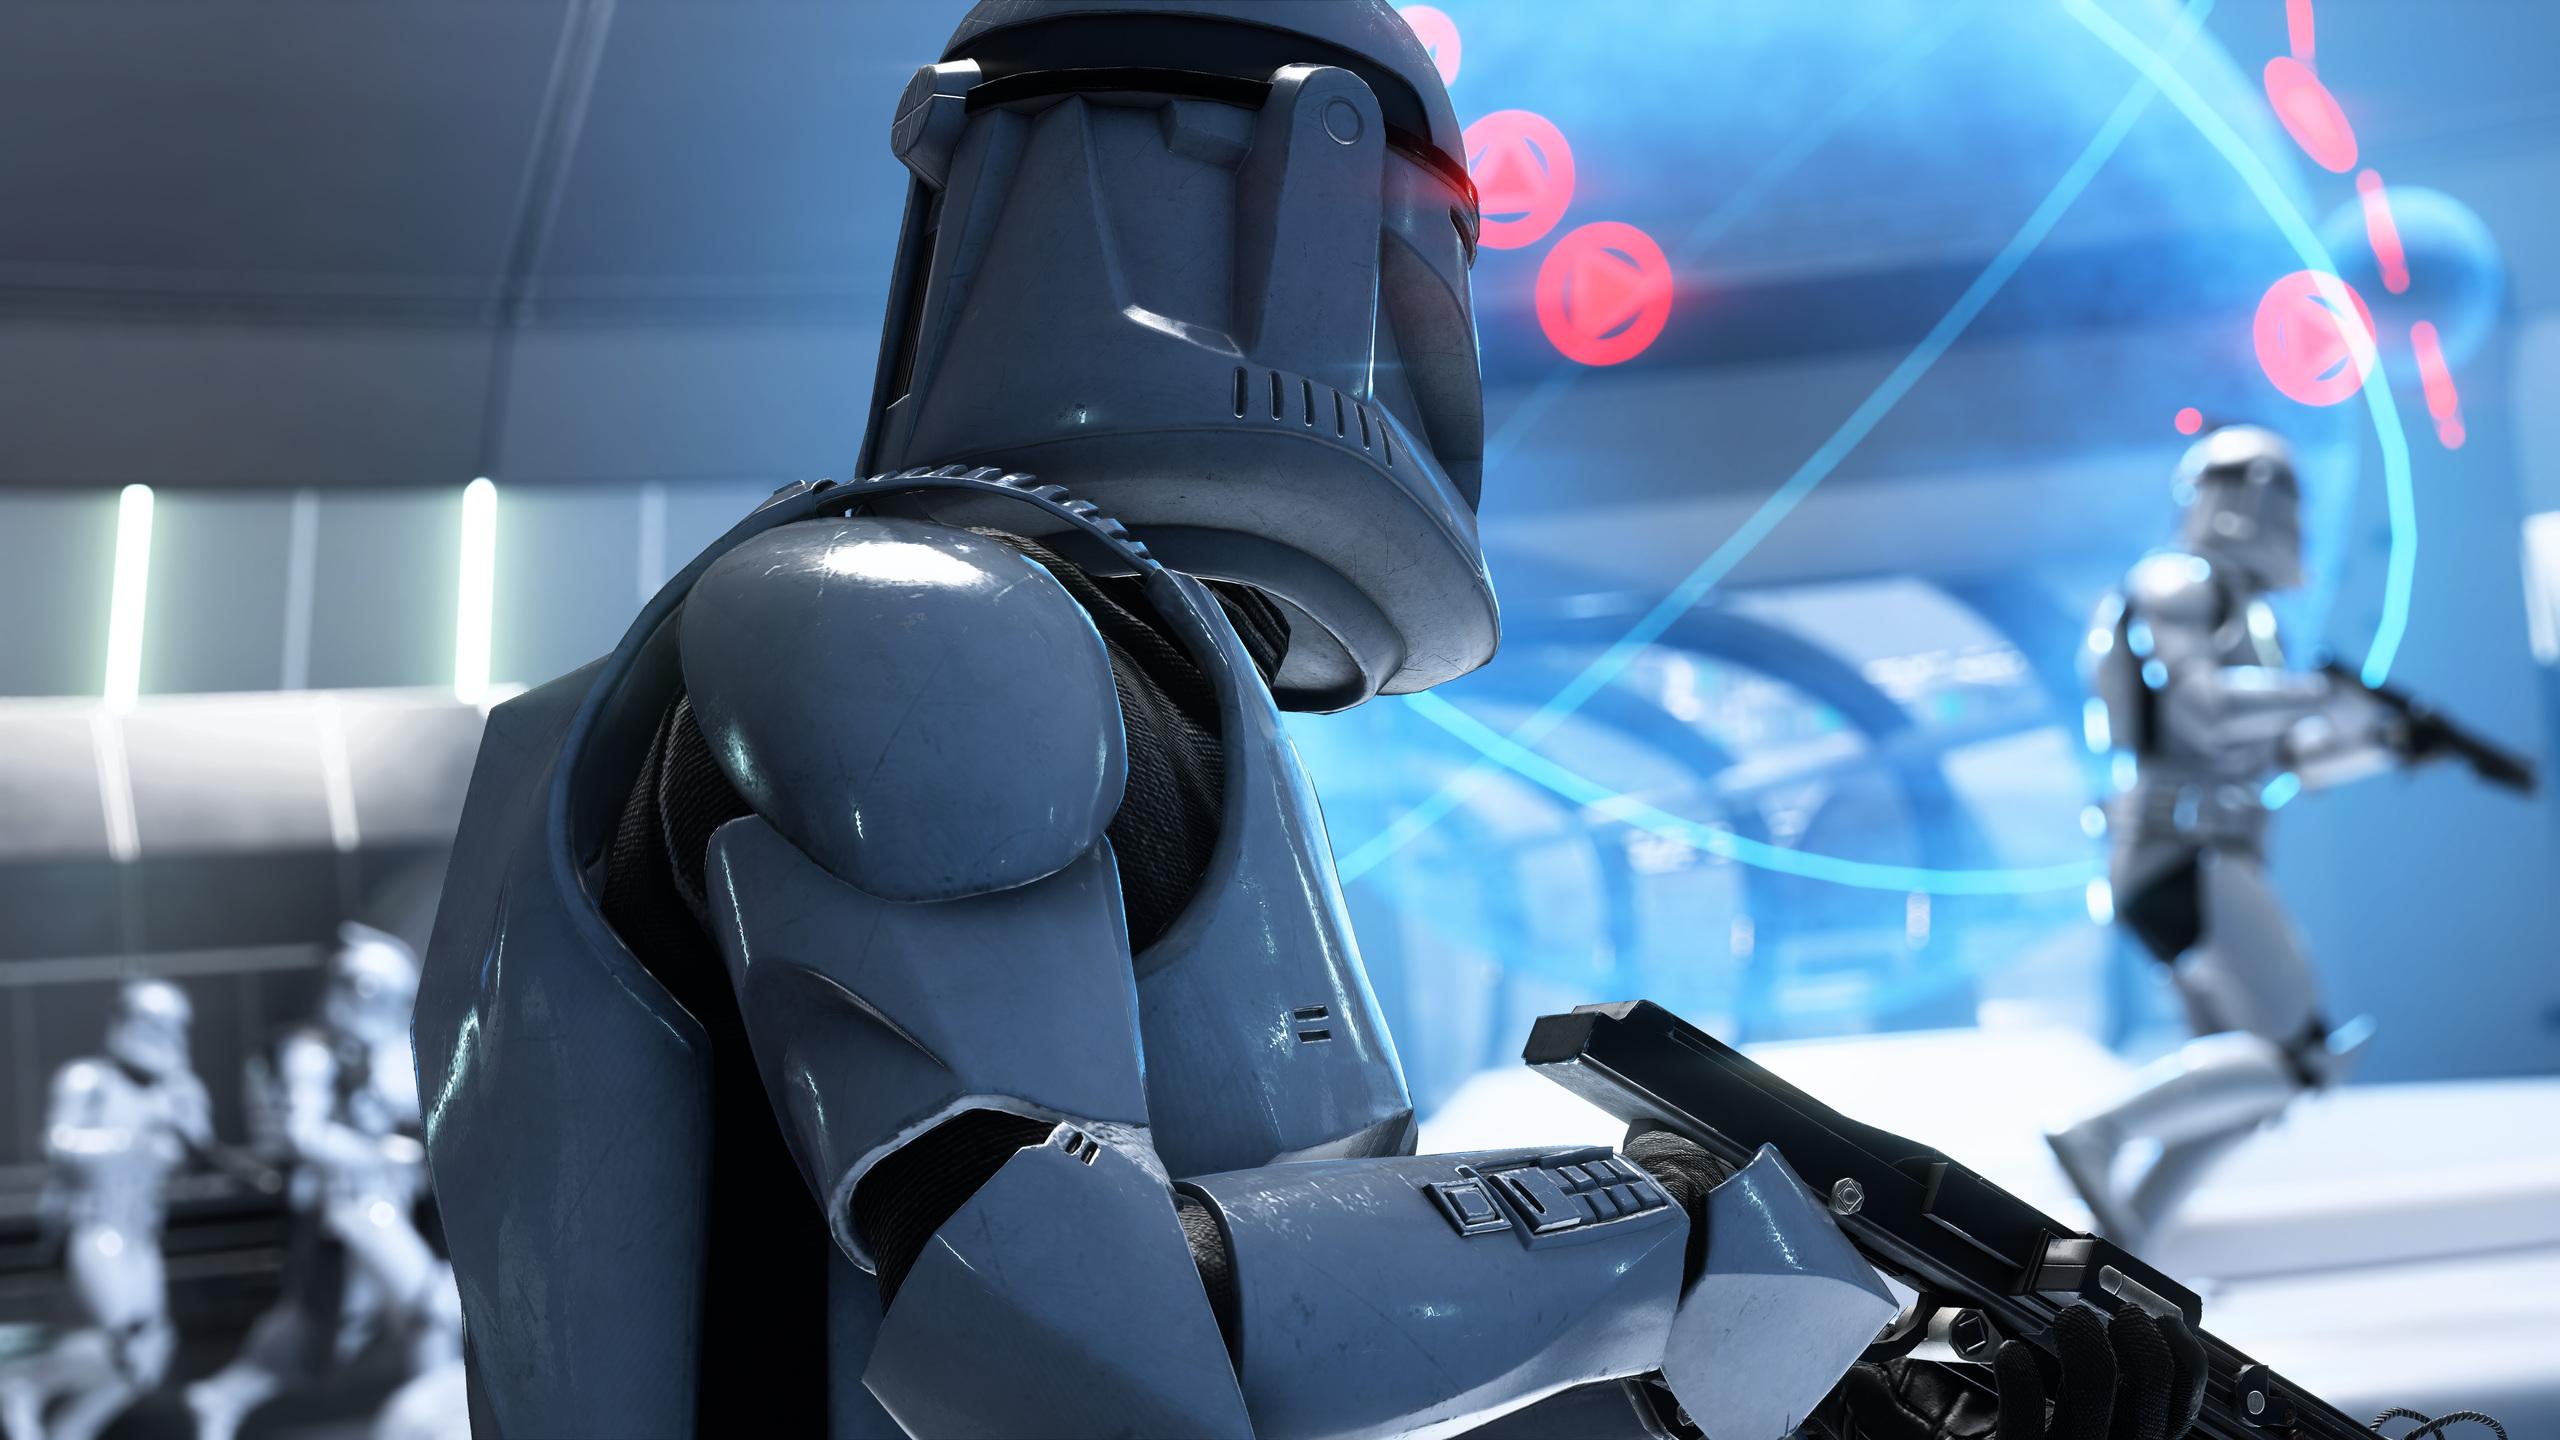 2560x1440 Star Wars Battlefront II 5k Video Game 1440P